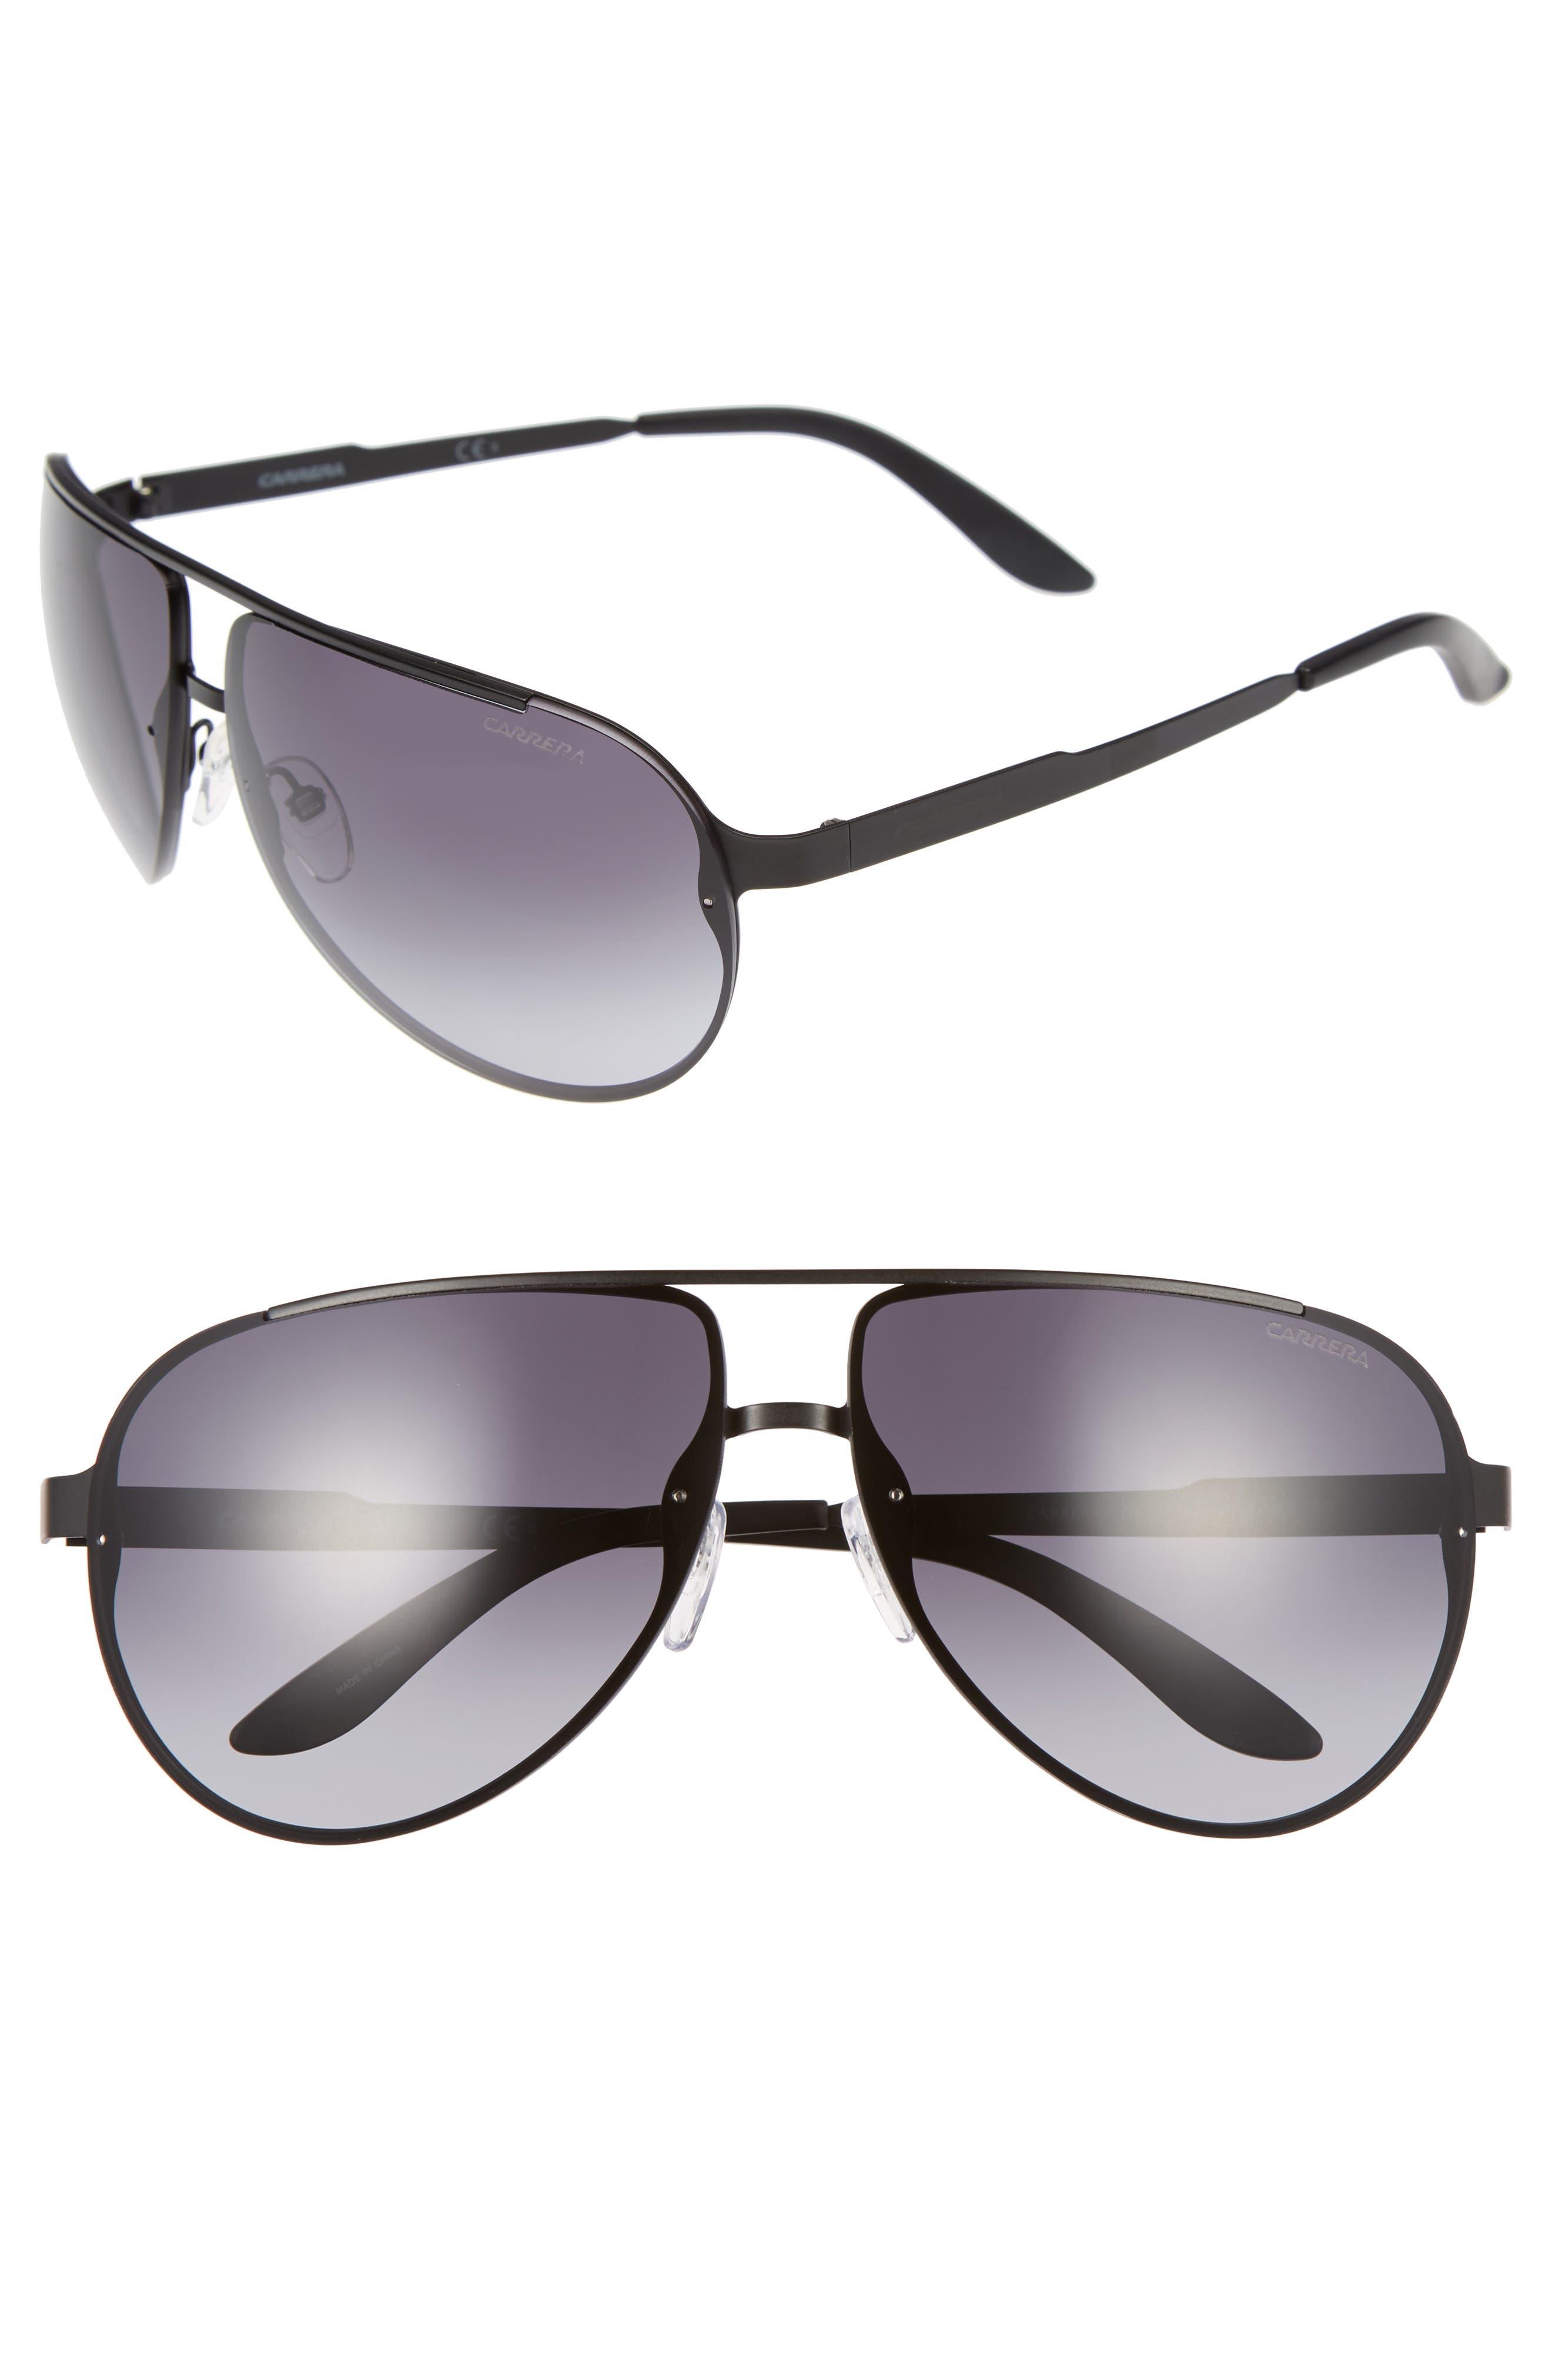 CA102 65mm Aviator Sunglasses,                             Alternate thumbnail 3, color,                             001